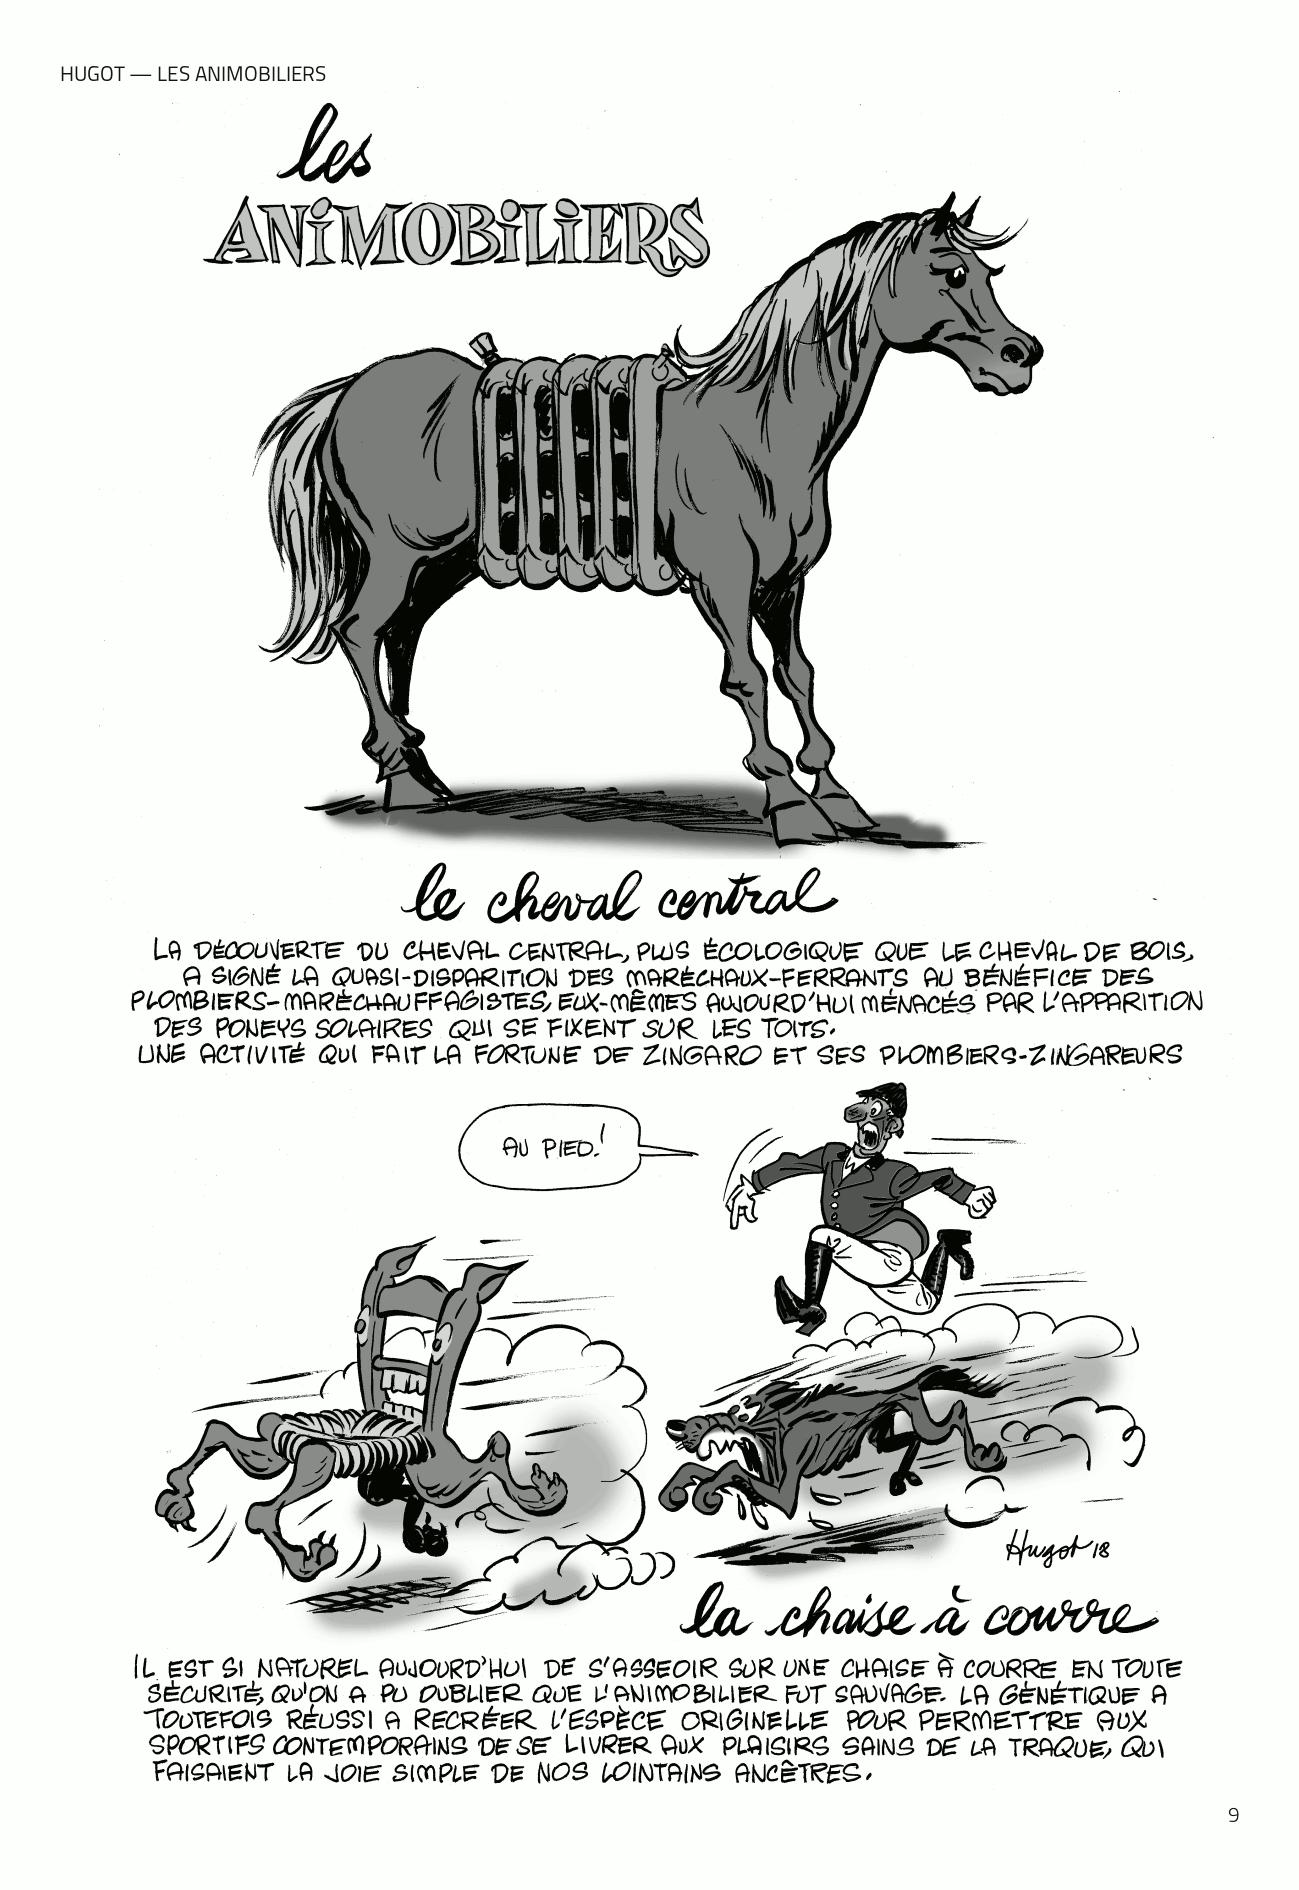 Hugot – Les animobiliers